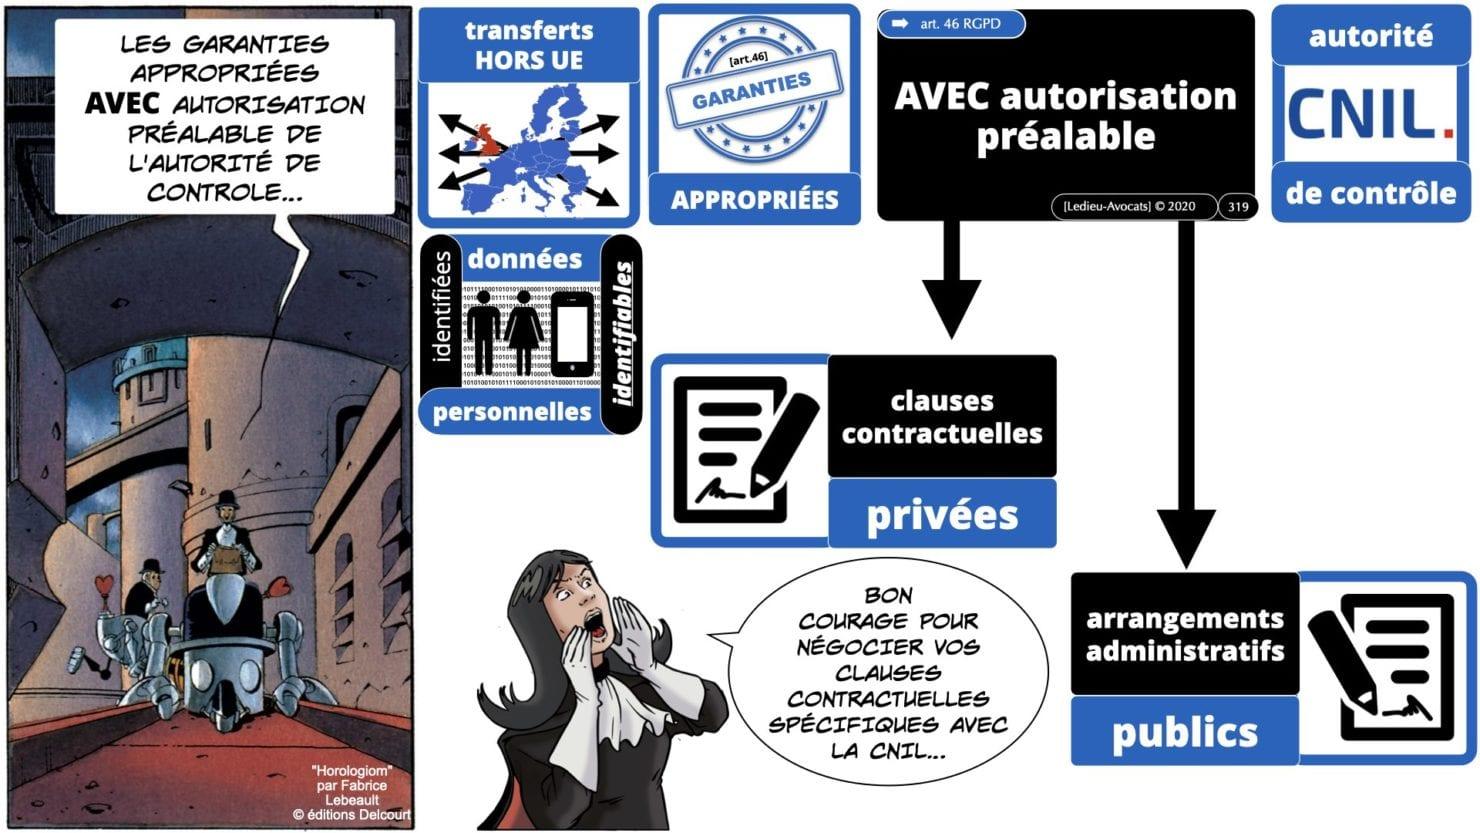 RGPD e-Privacy principes actualité jurisprudence ©Ledieu-Avocats 25-06-2021.319